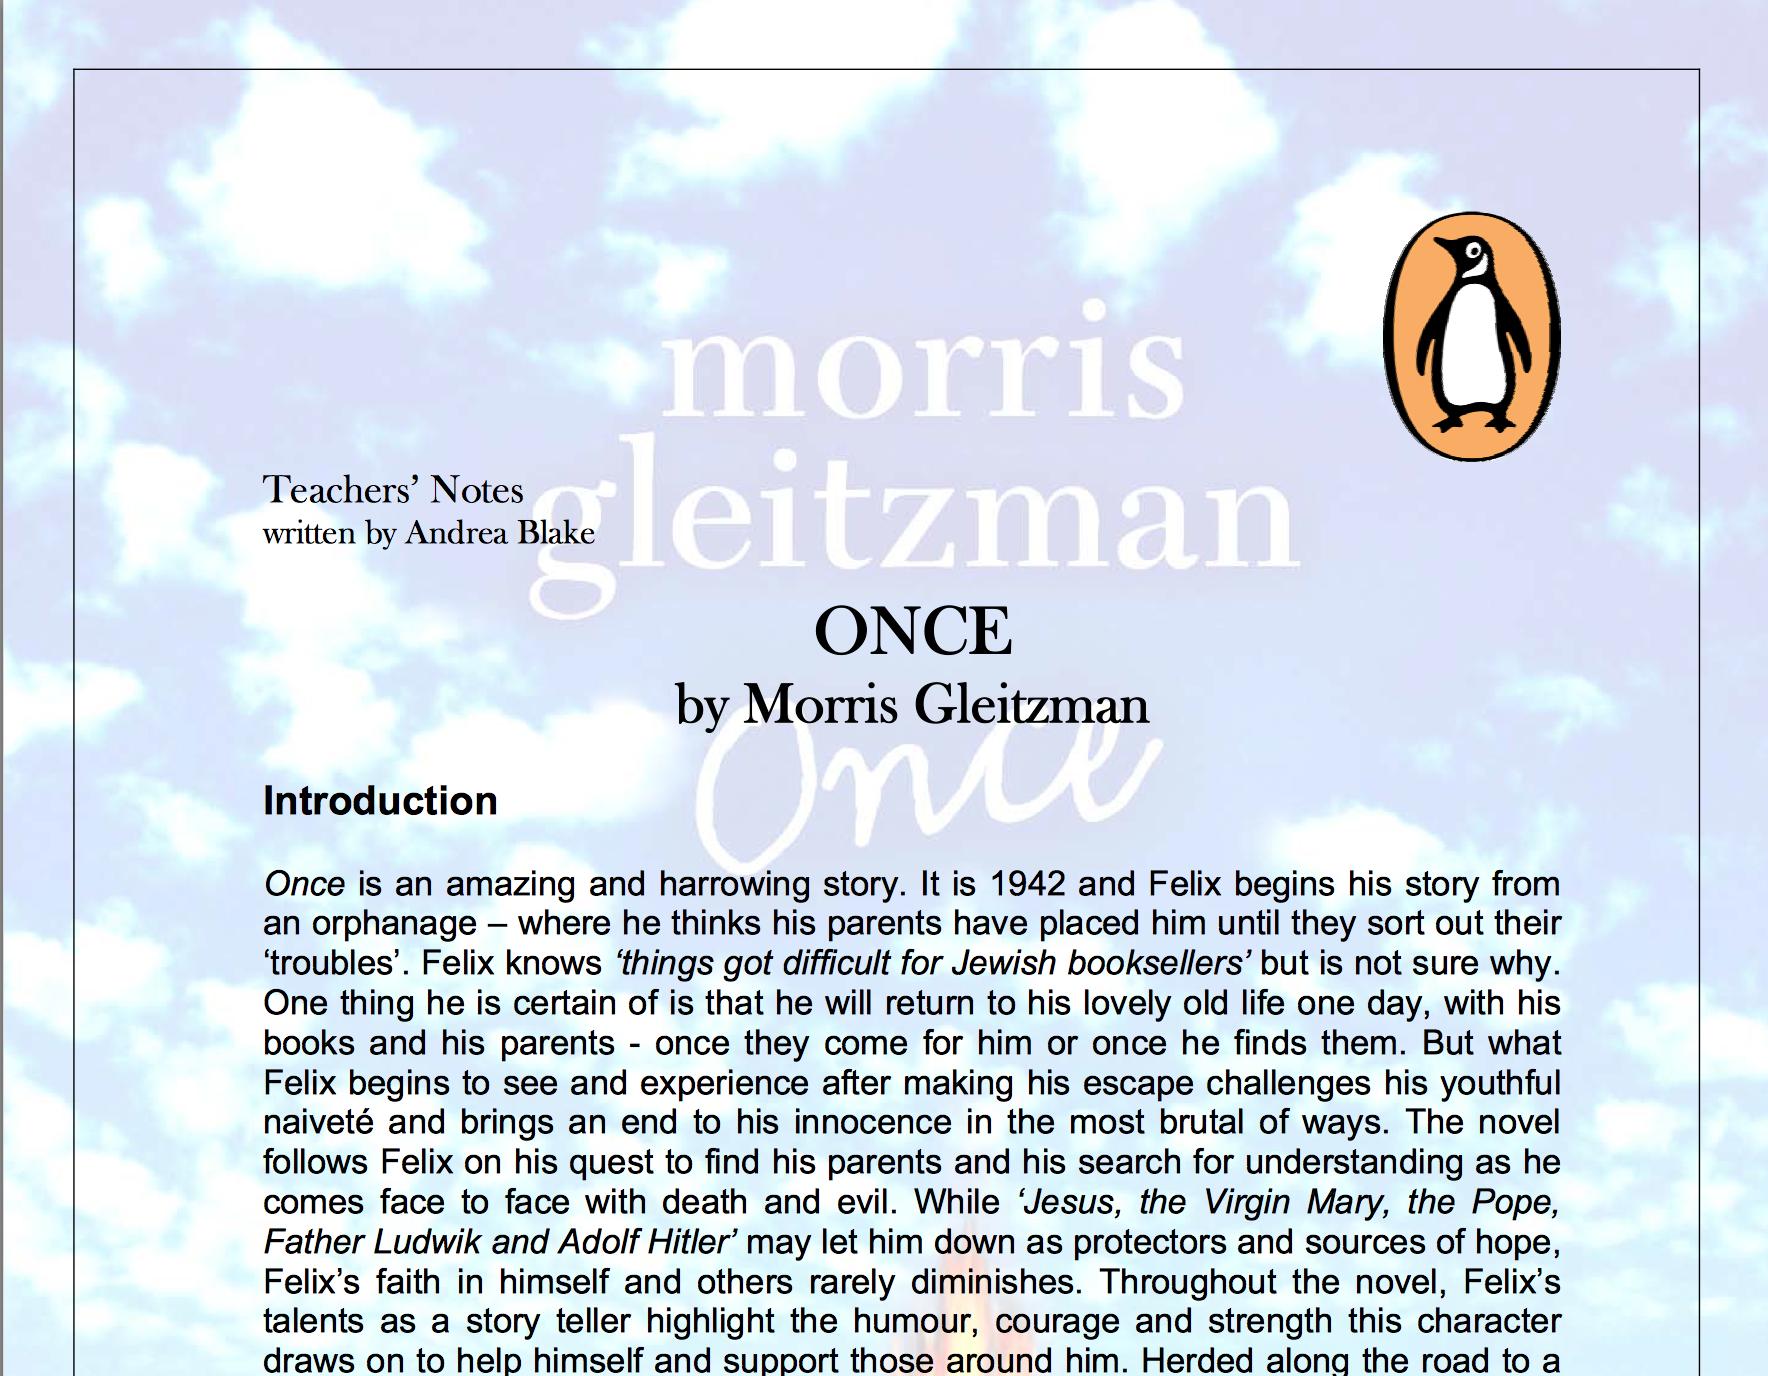 Teacher S Noteshttp Www Penguin Com Au Educationcentre Pdf Teachers Notes Pdf 0143301950 Pdf Teacher Notes Teachers Morris Gleitzman